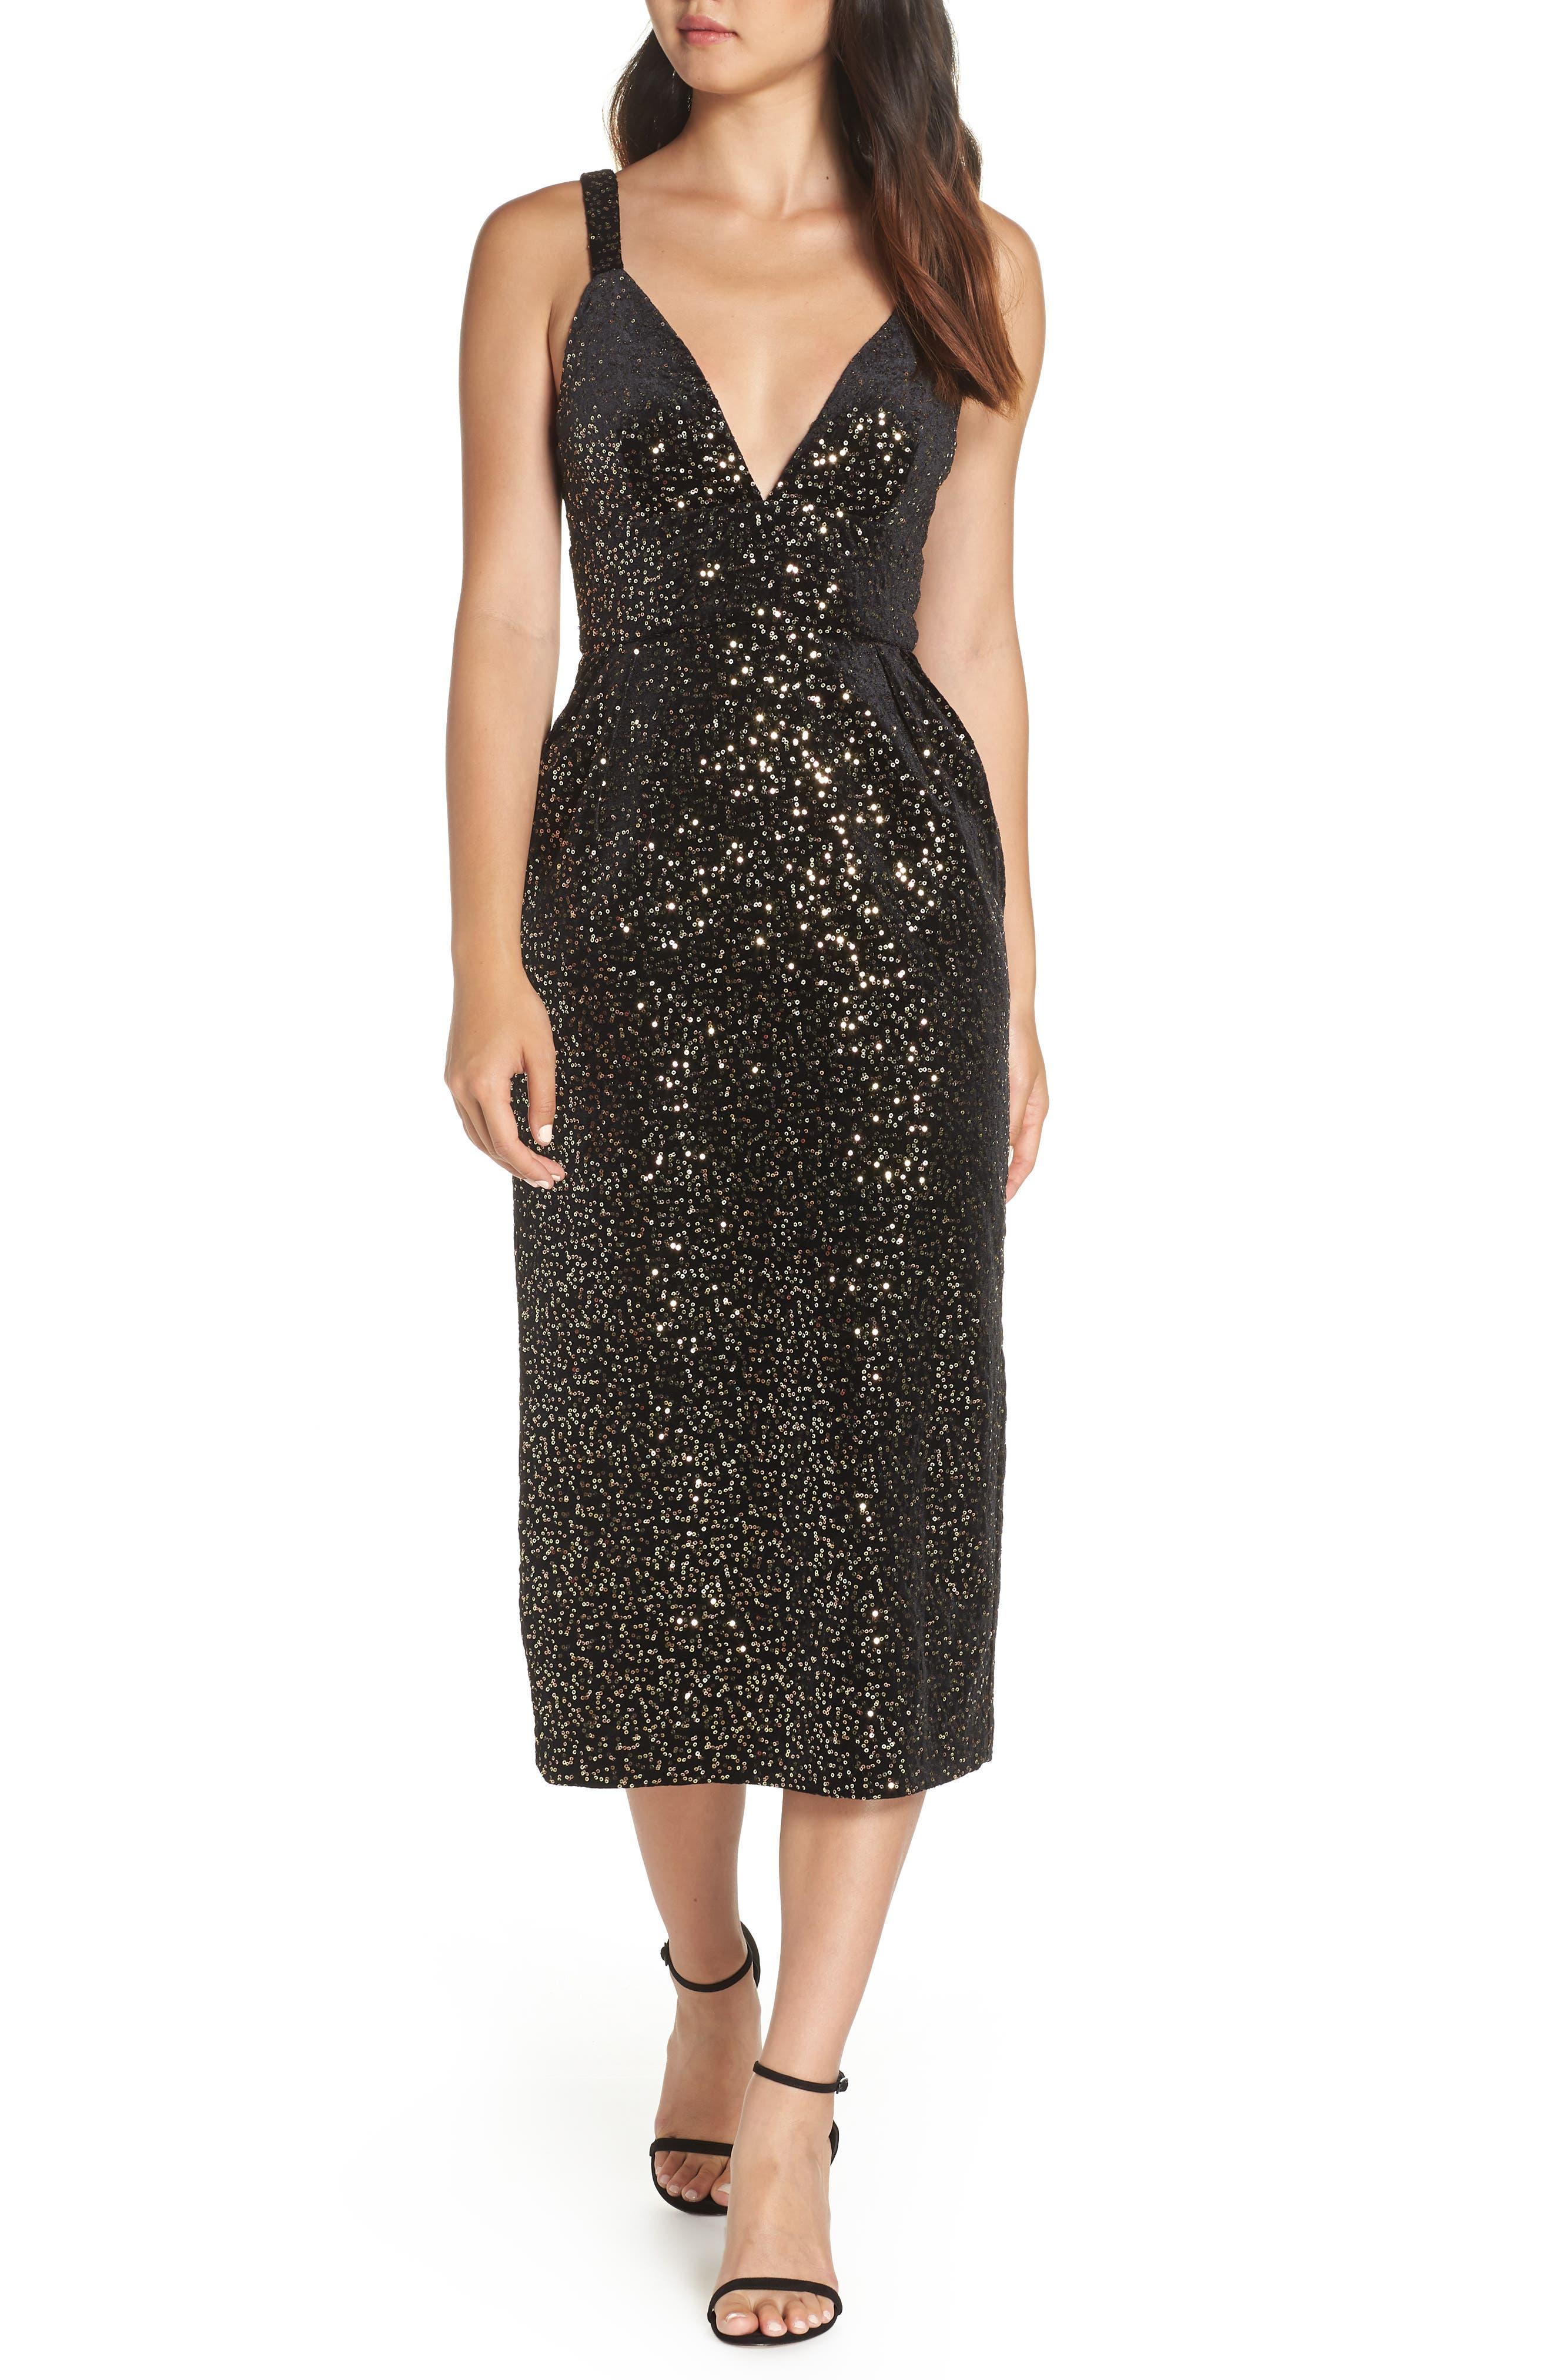 Velvet & Sequin Embellished Midi Dress in Black/ Gold